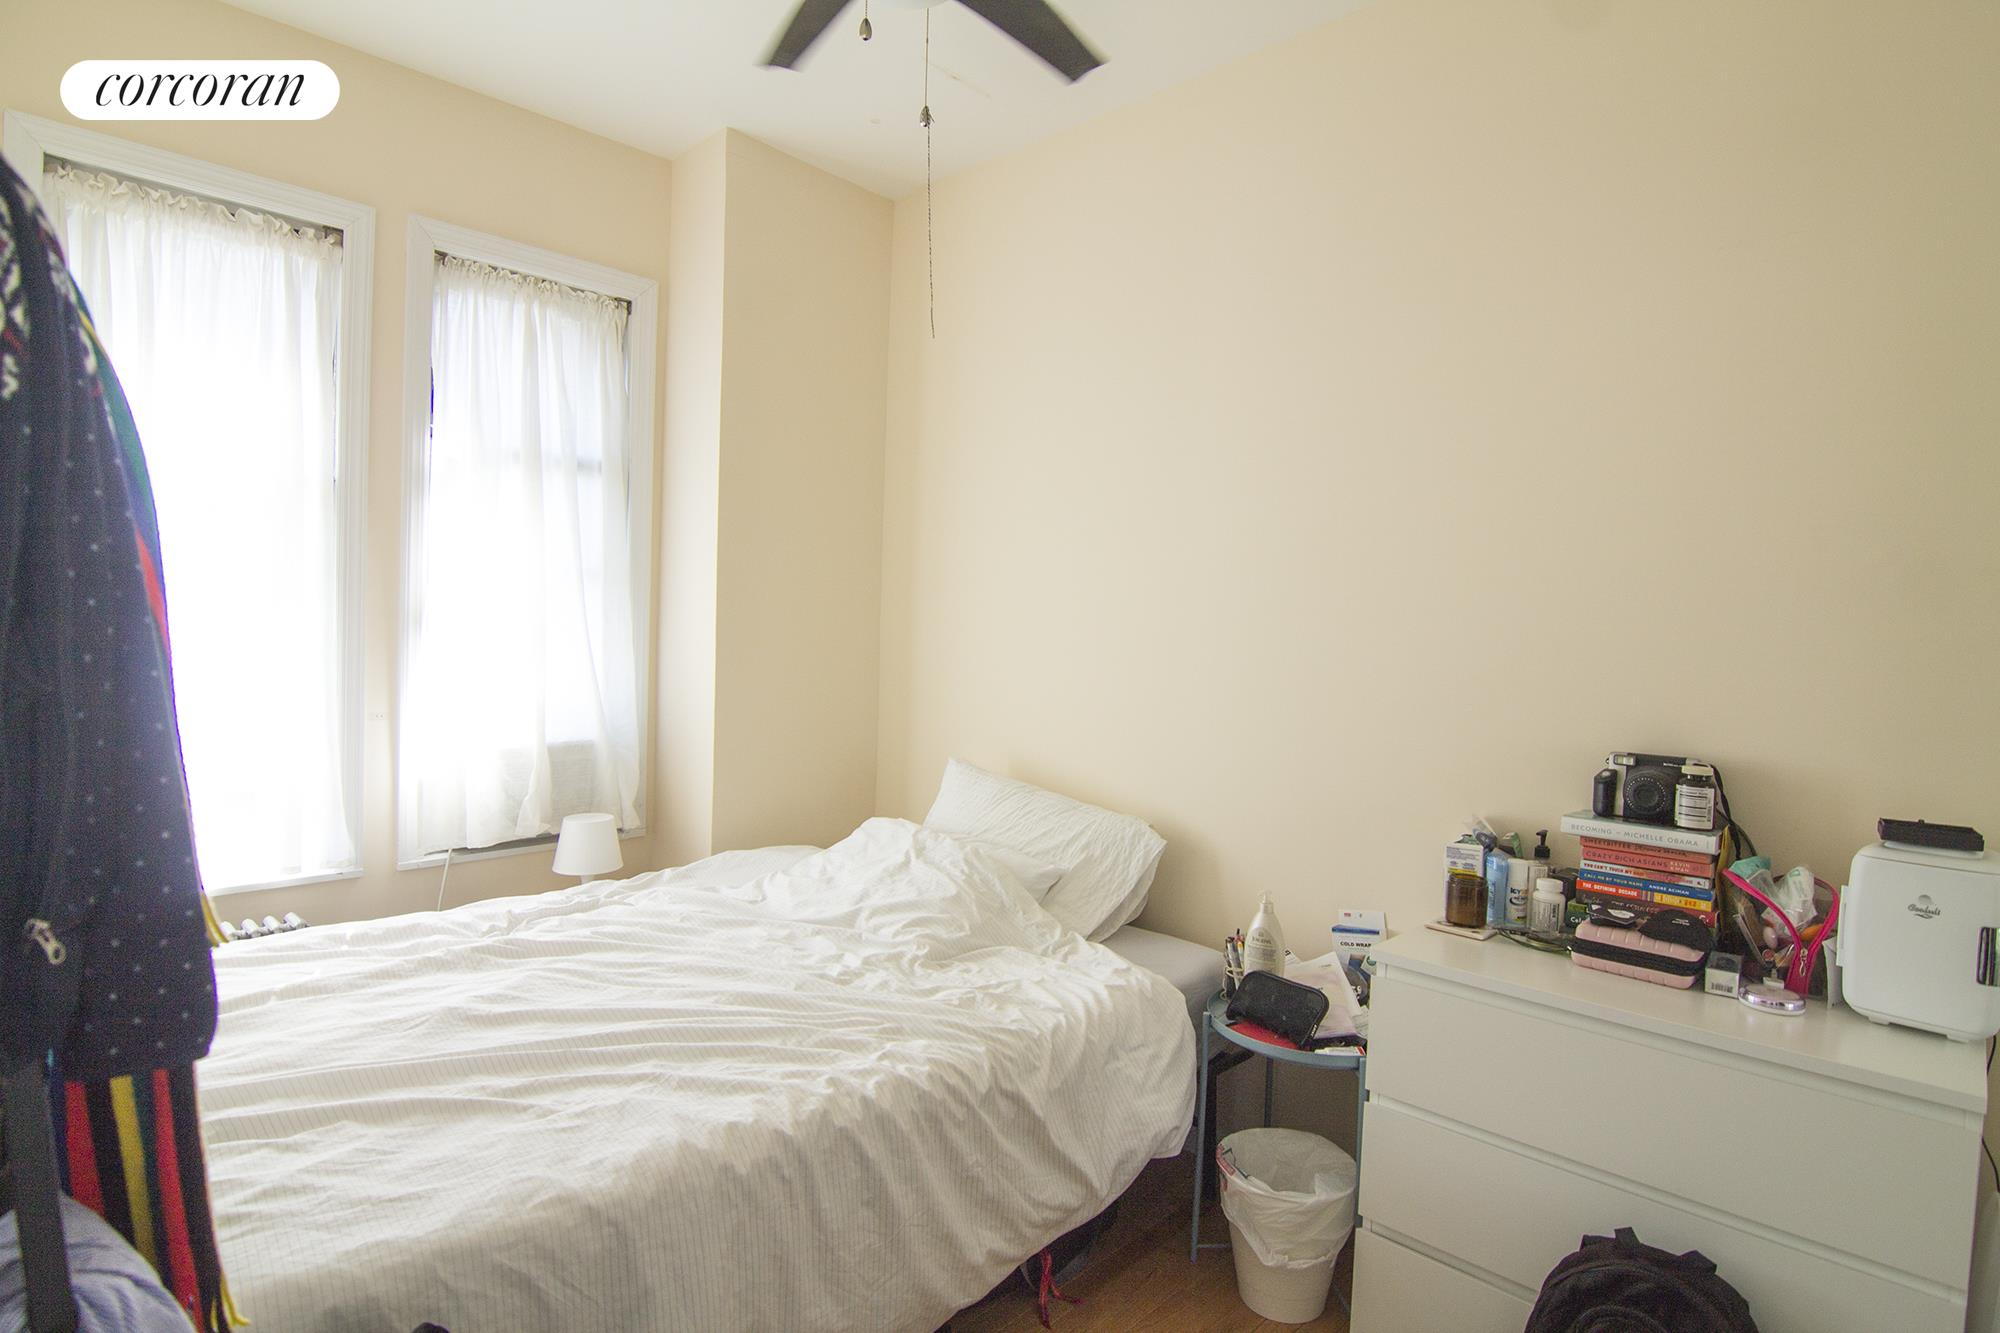 84 Havemeyer Street Williamsburg Brooklyn NY 11211